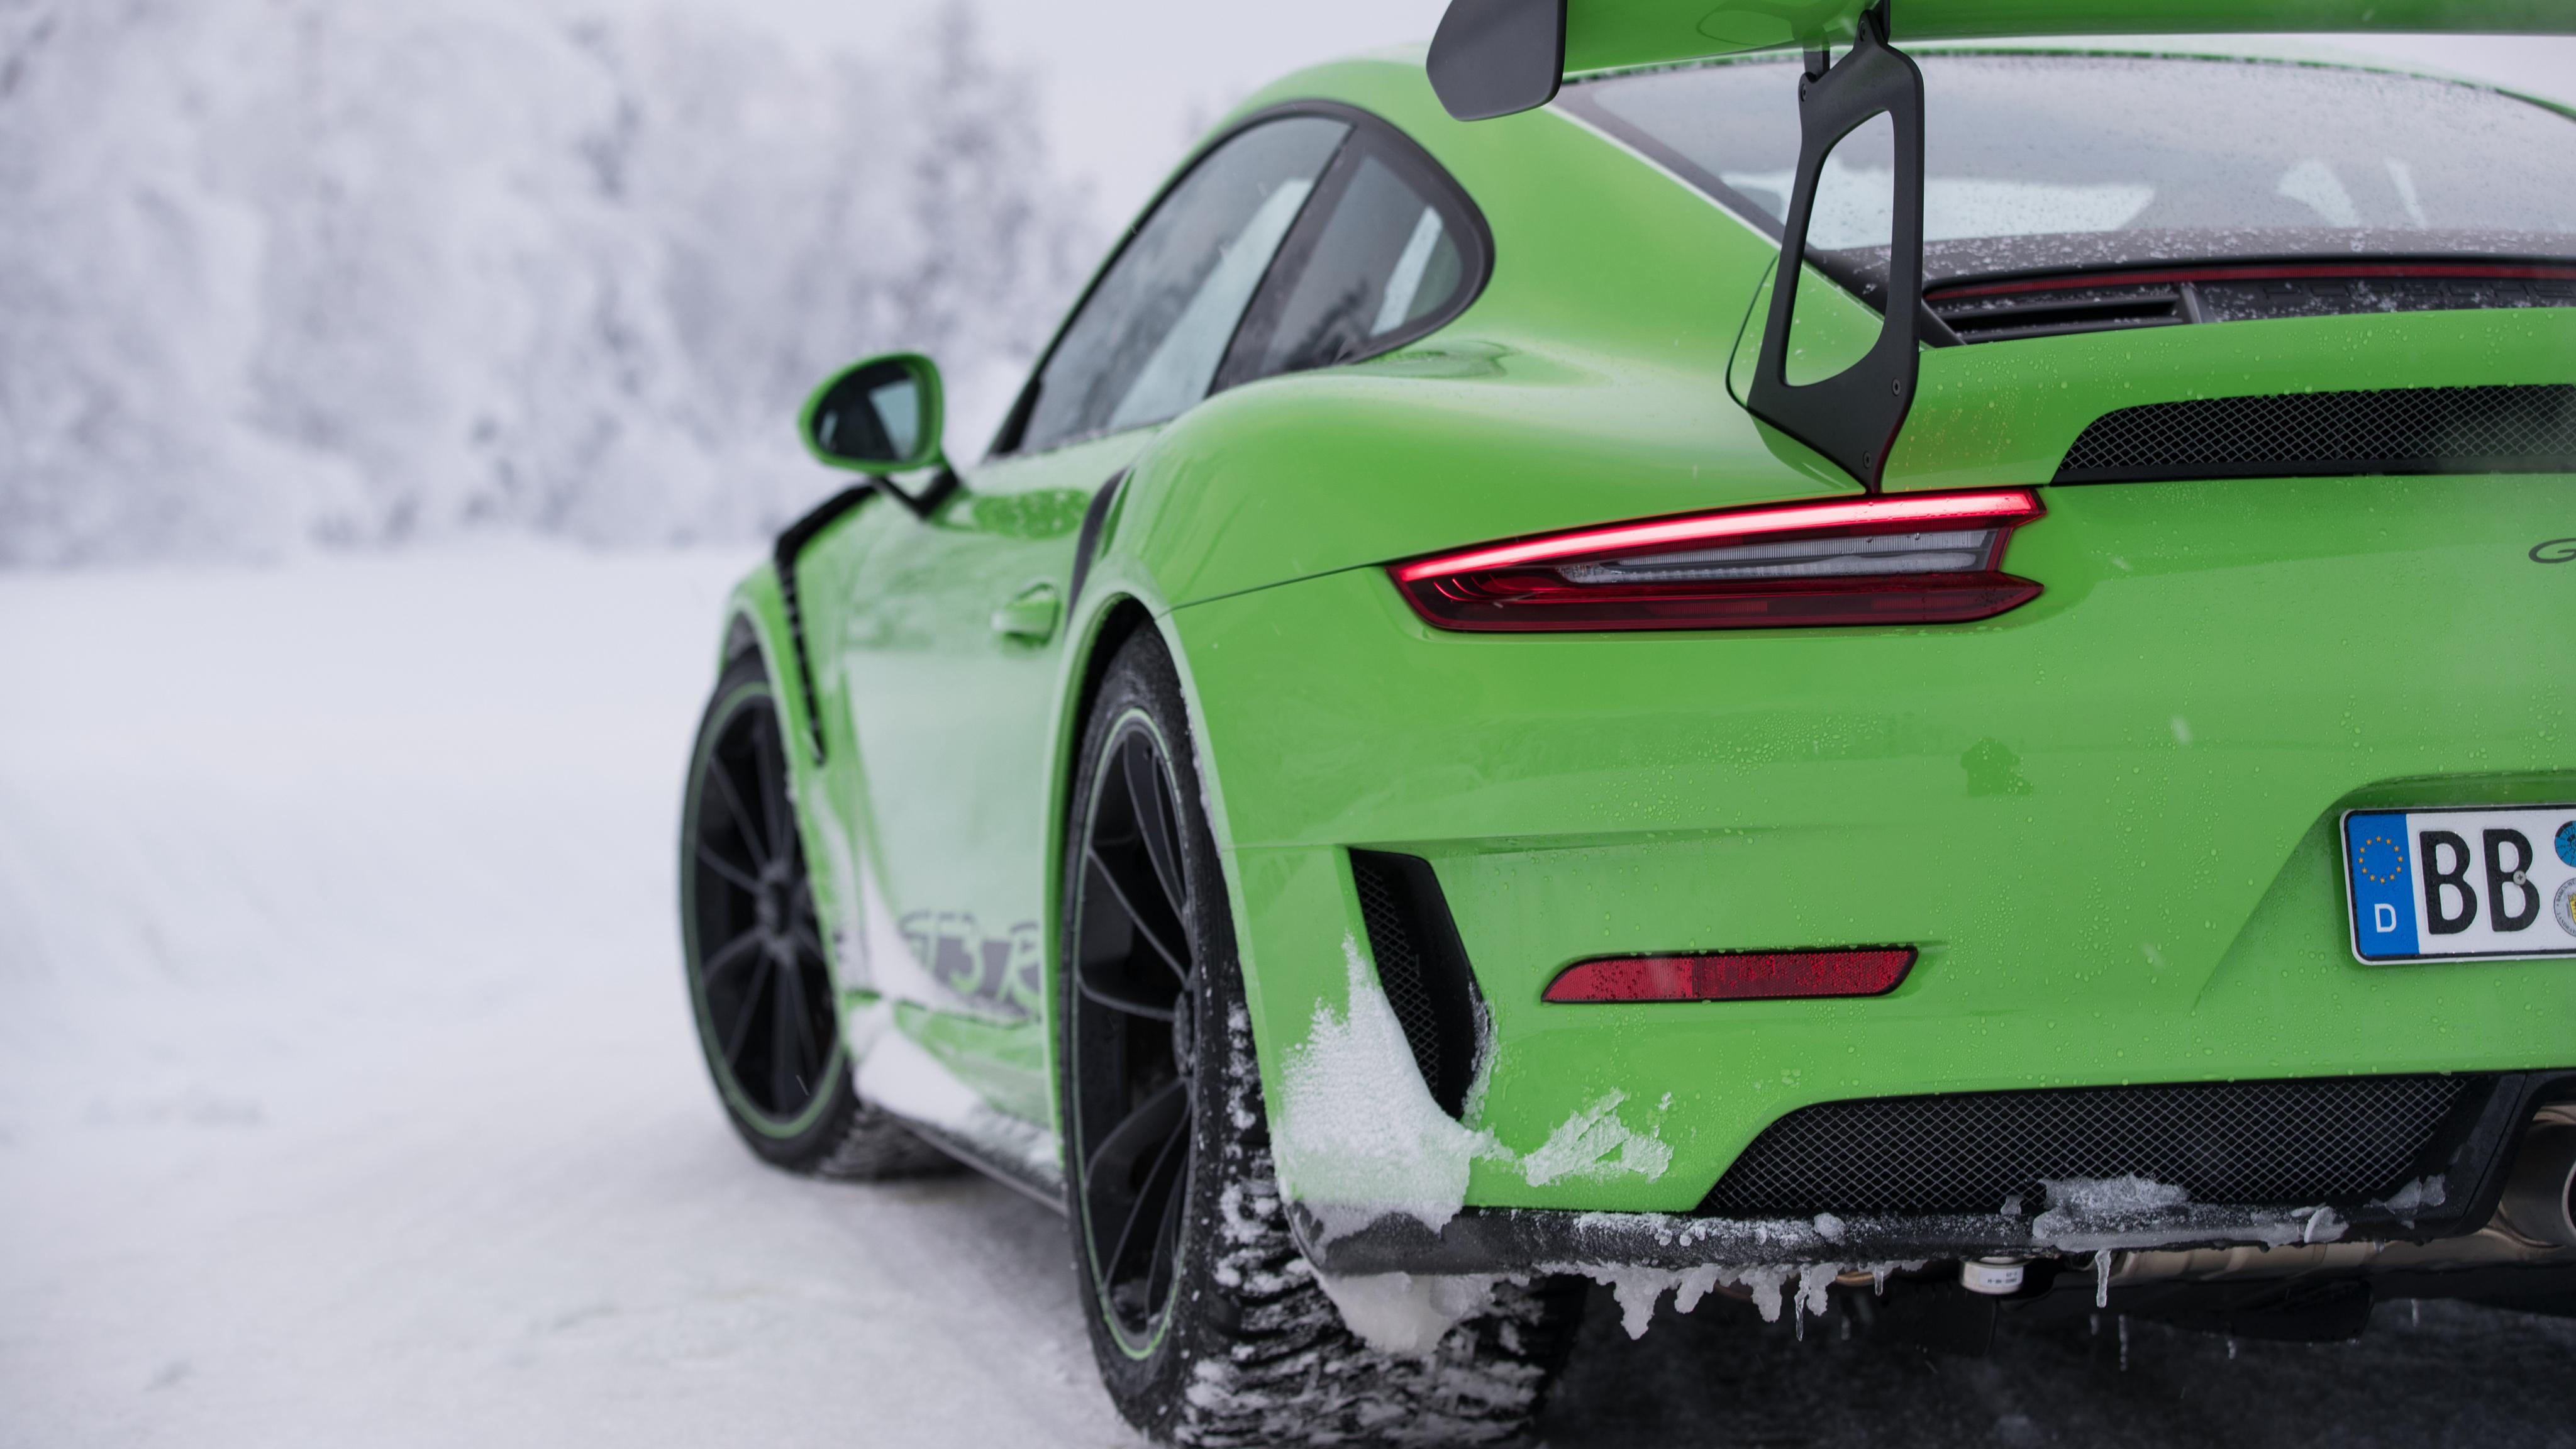 Mazda 2 Gt >> 2018 Porsche 911 GT3 RS 4K 2 Wallpaper | HD Car Wallpapers | ID #9665